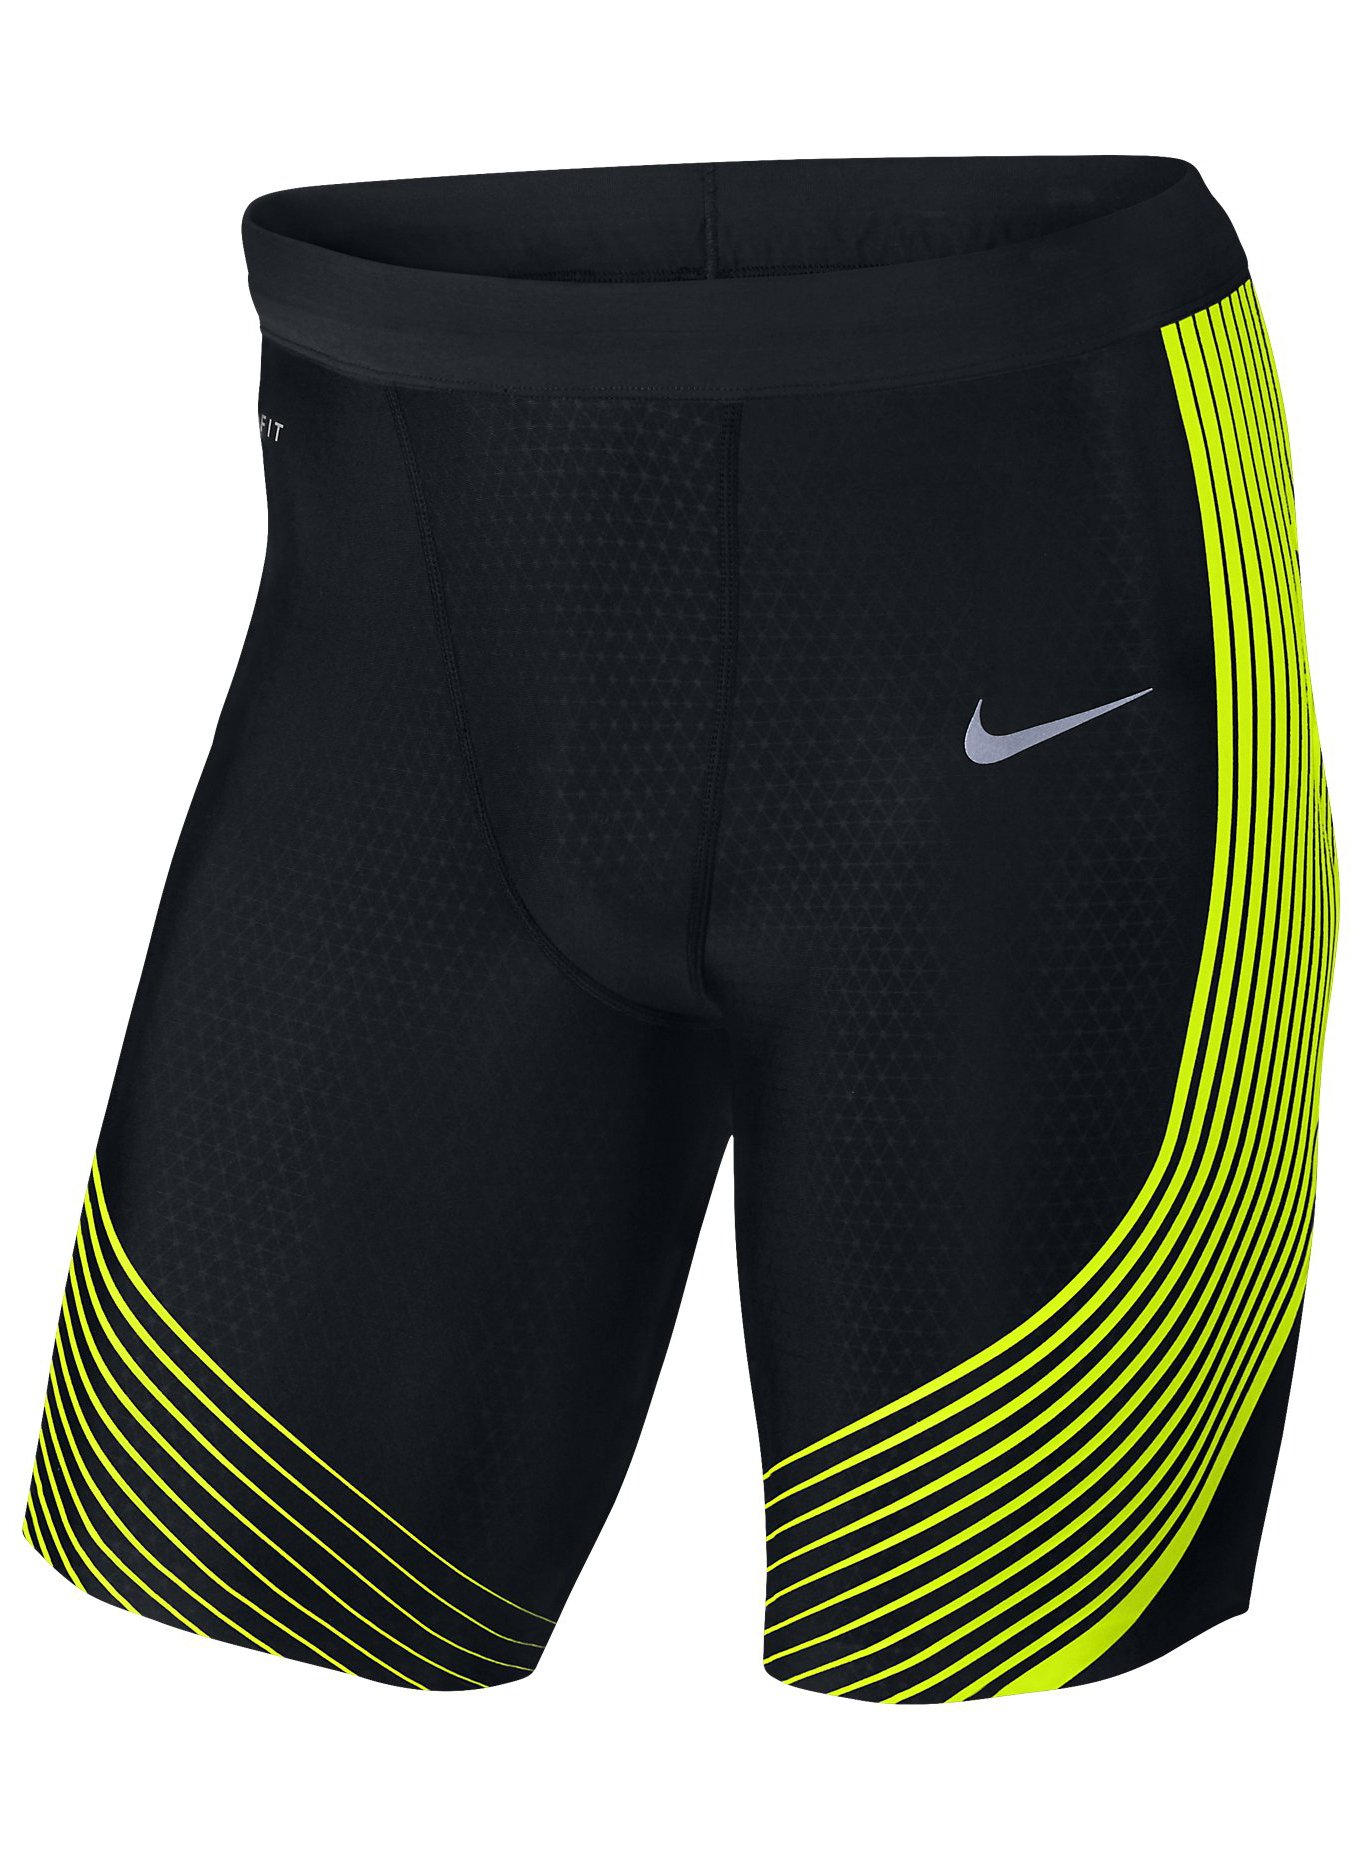 Běžecké legíny Nike Power Speed